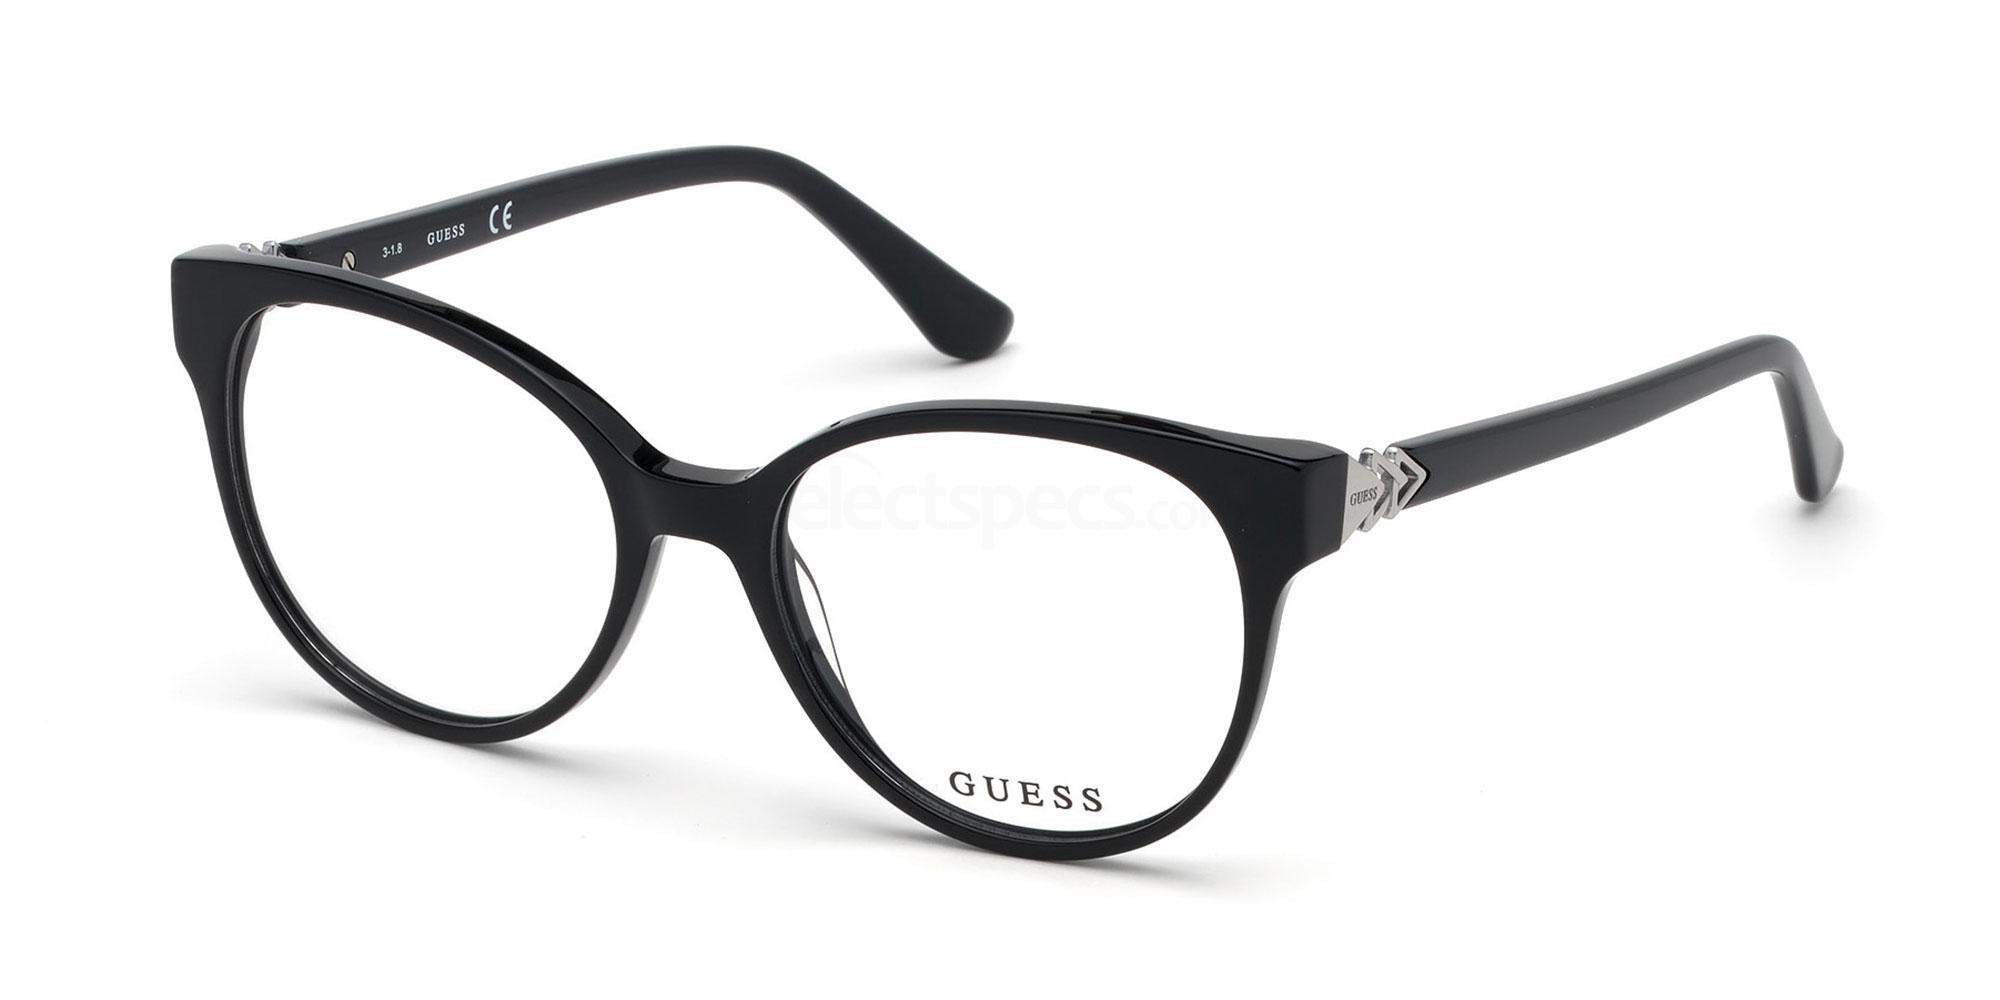 001 GU2695 Glasses, Guess